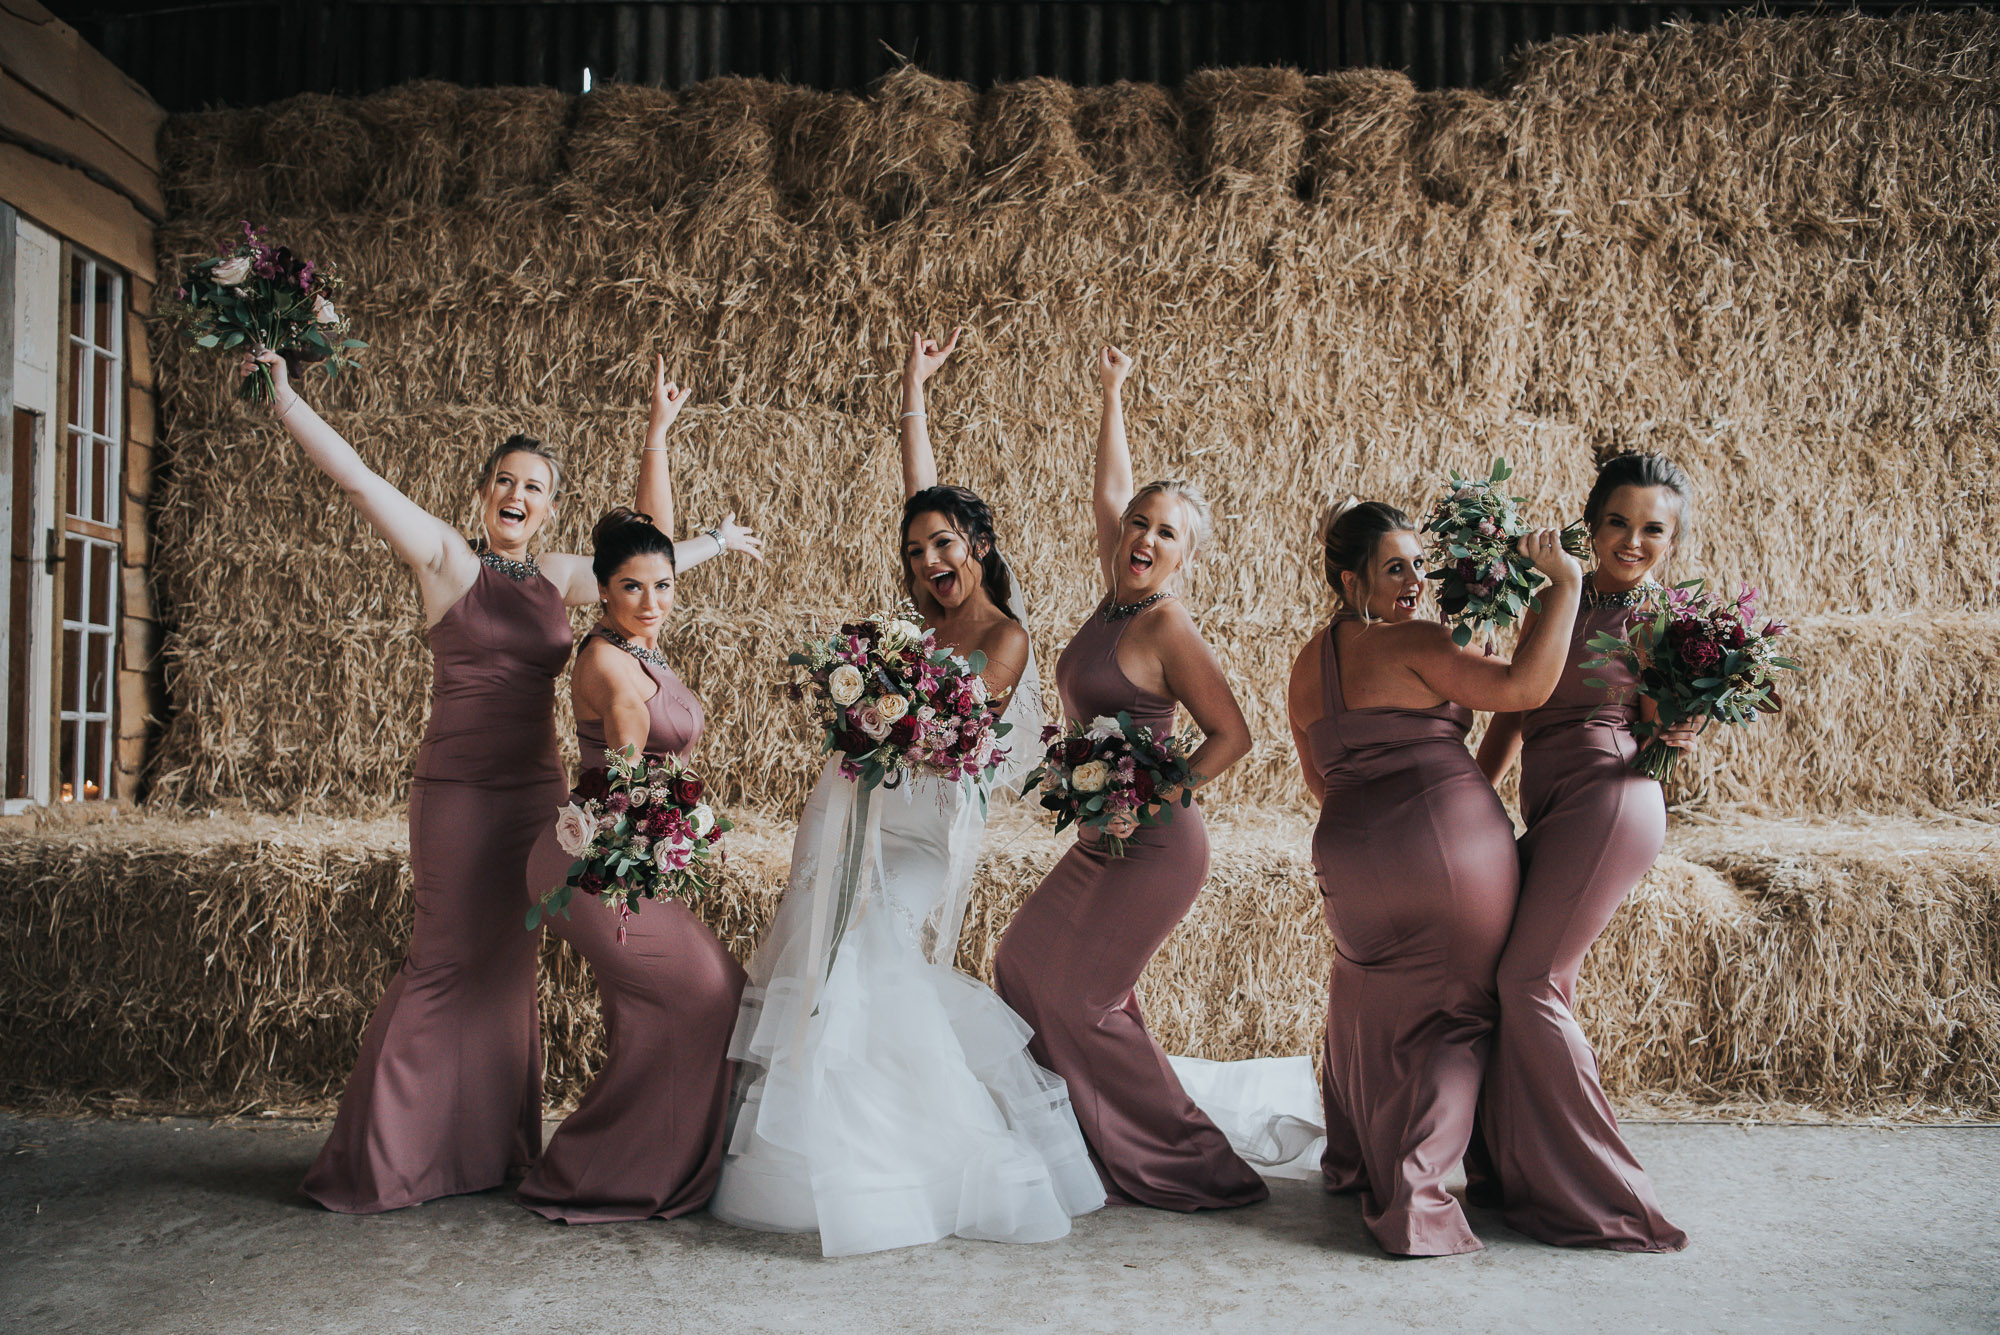 Owen house wedding barn wedding photographer north west cheshire england (29 of 38).jpg